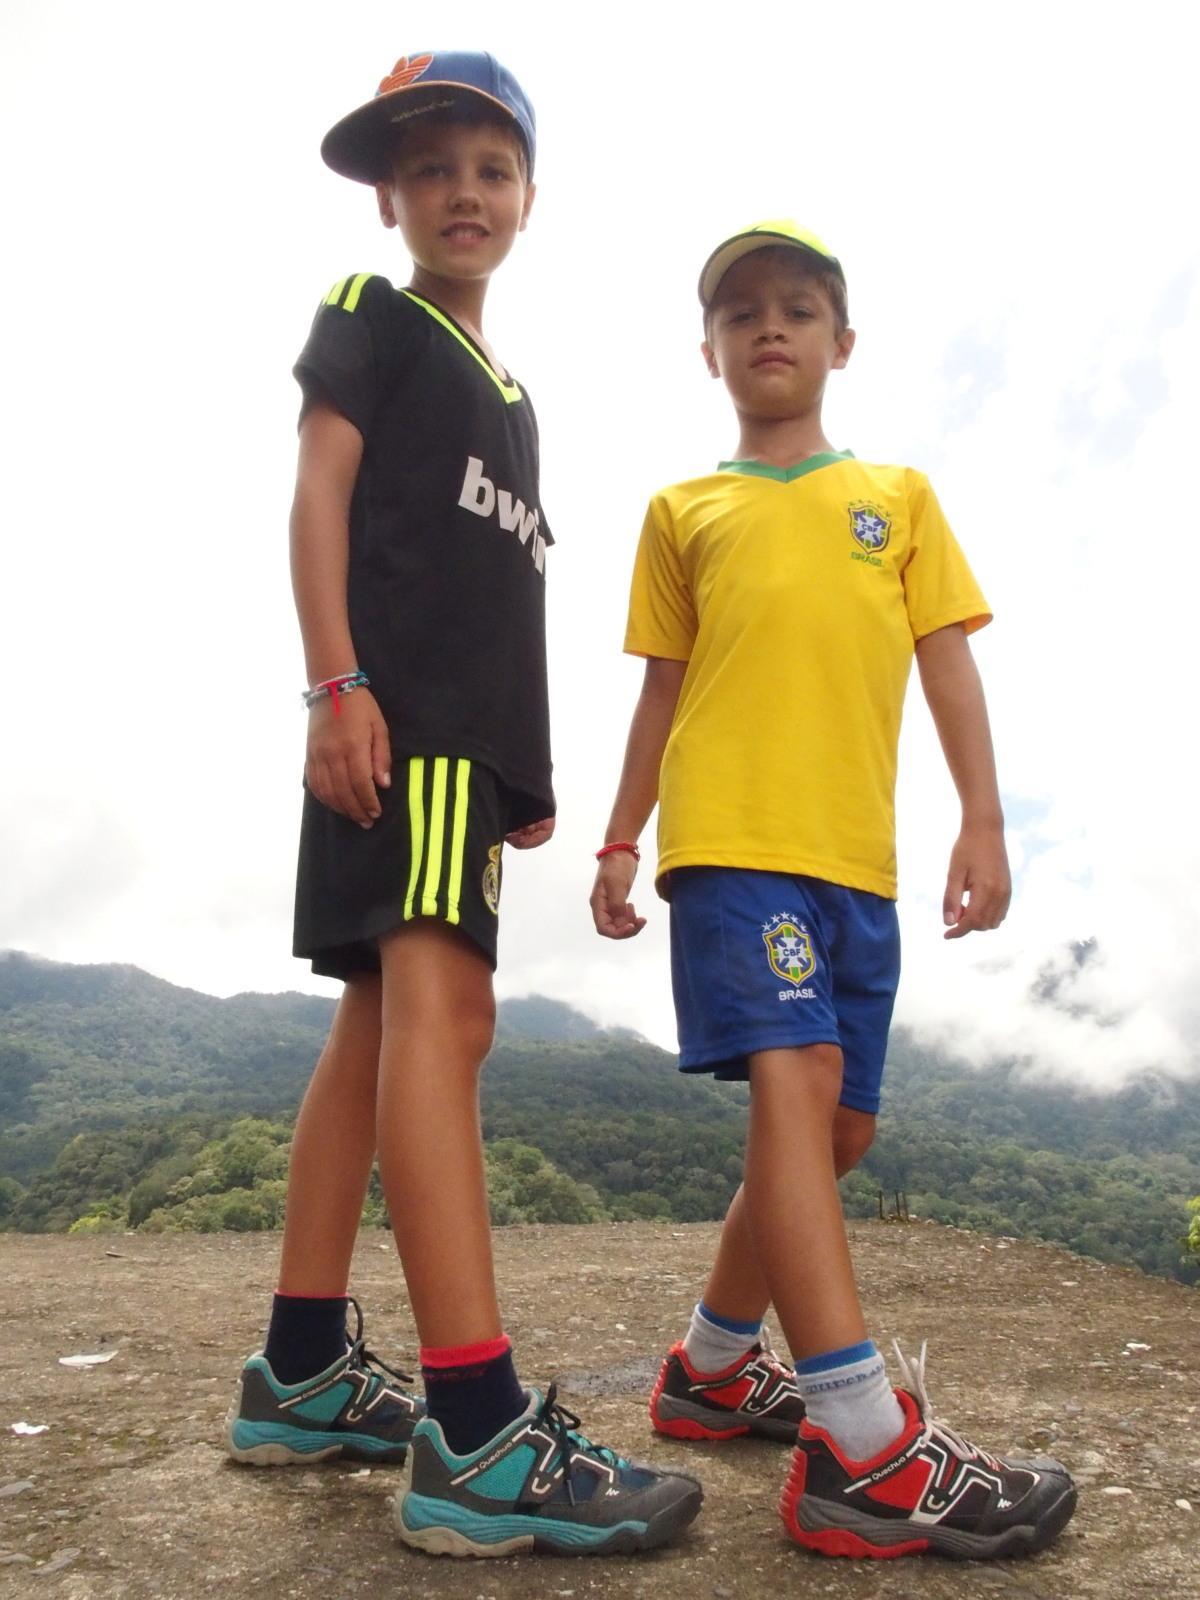 Chaussures Kalenji à Bali